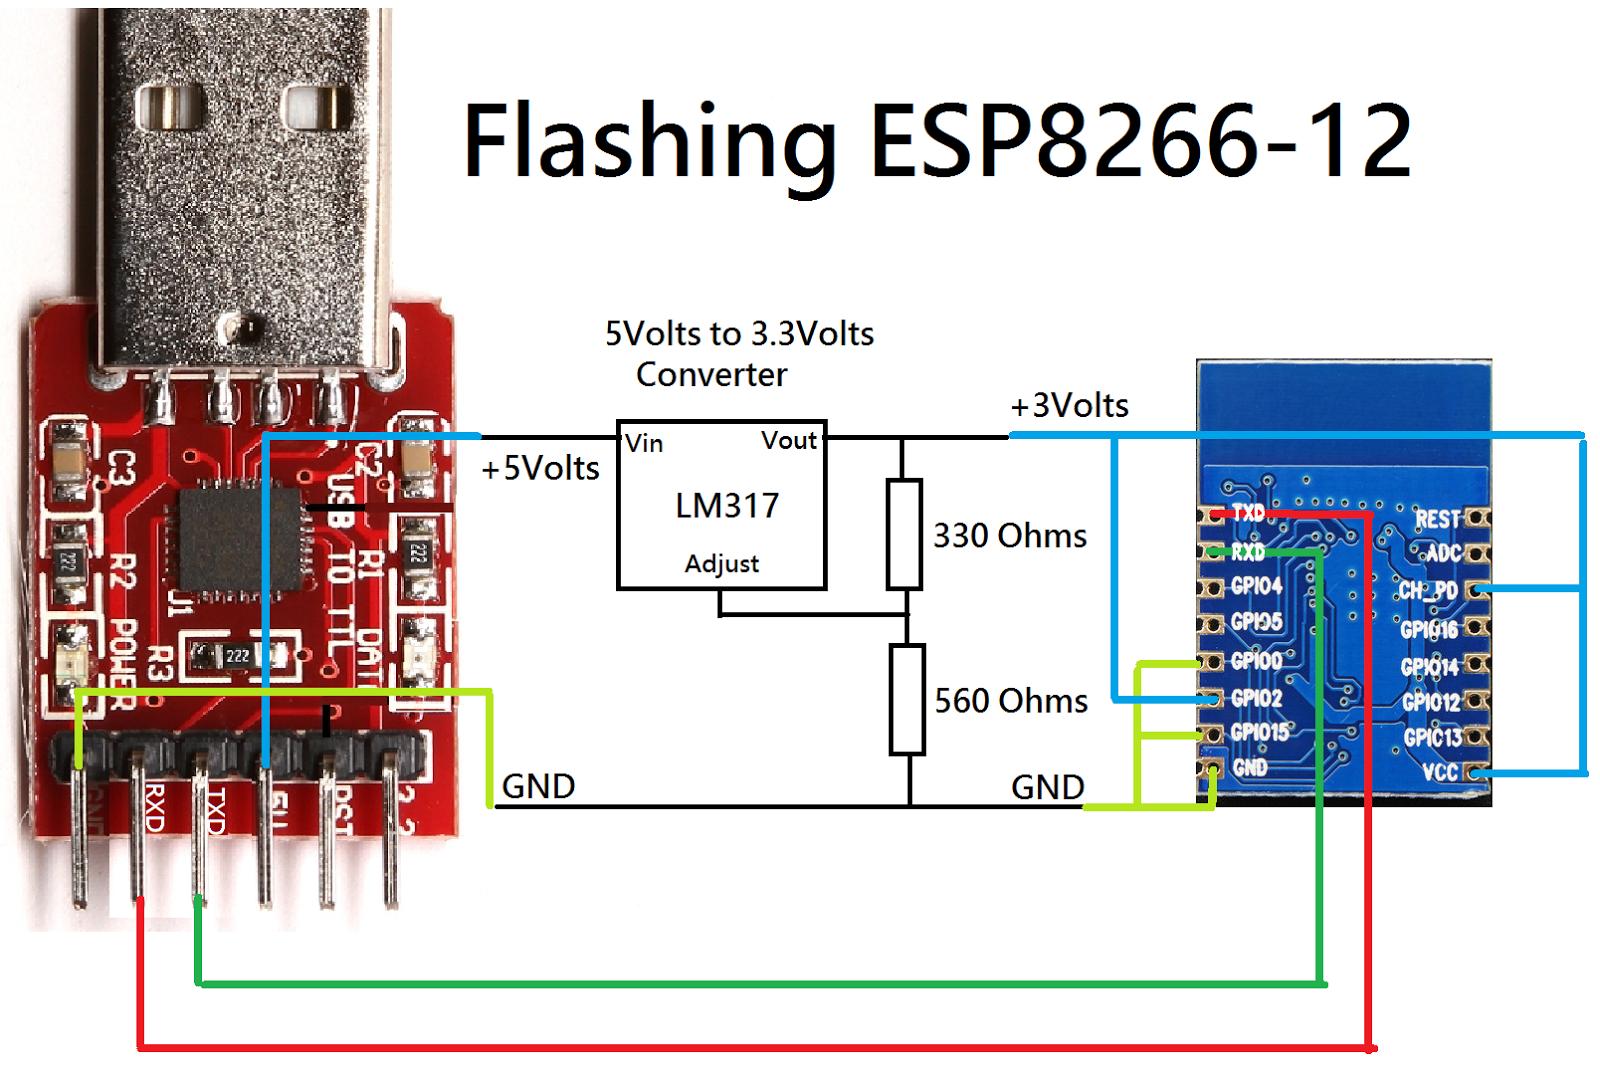 Flashing ESP8266 Datasheet